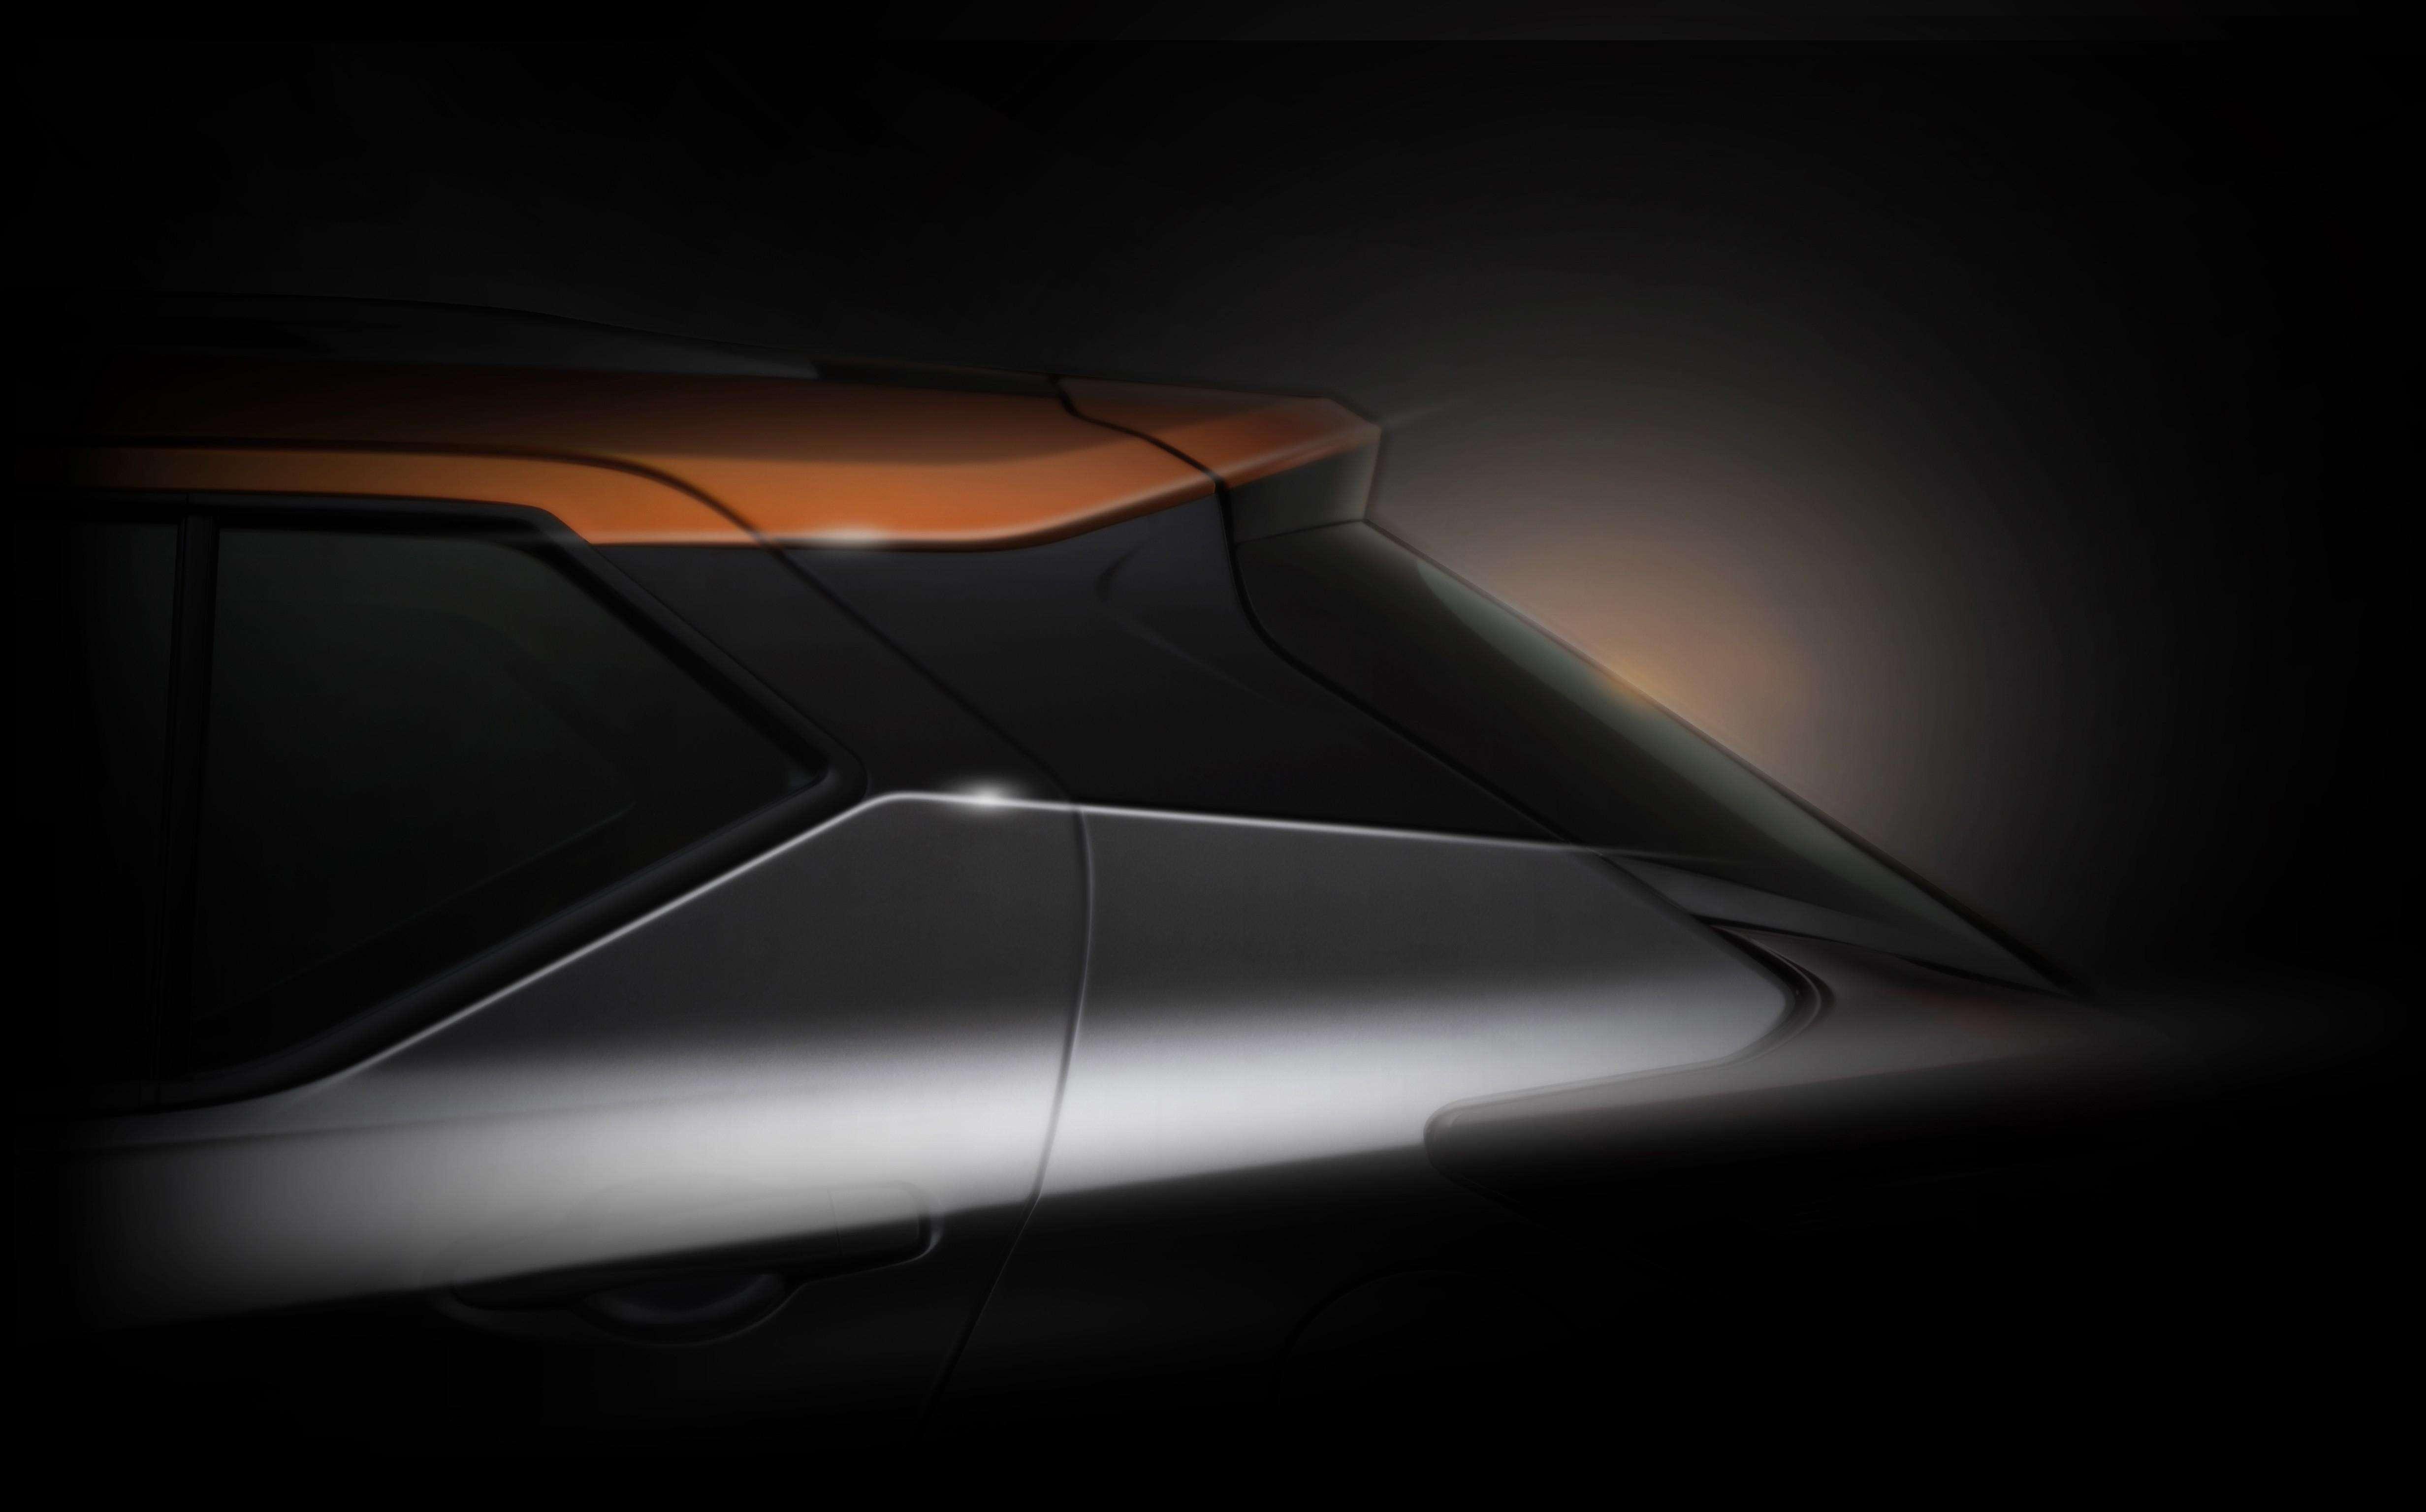 Nissan revela detalhe de estilo do novo SUV Kicks